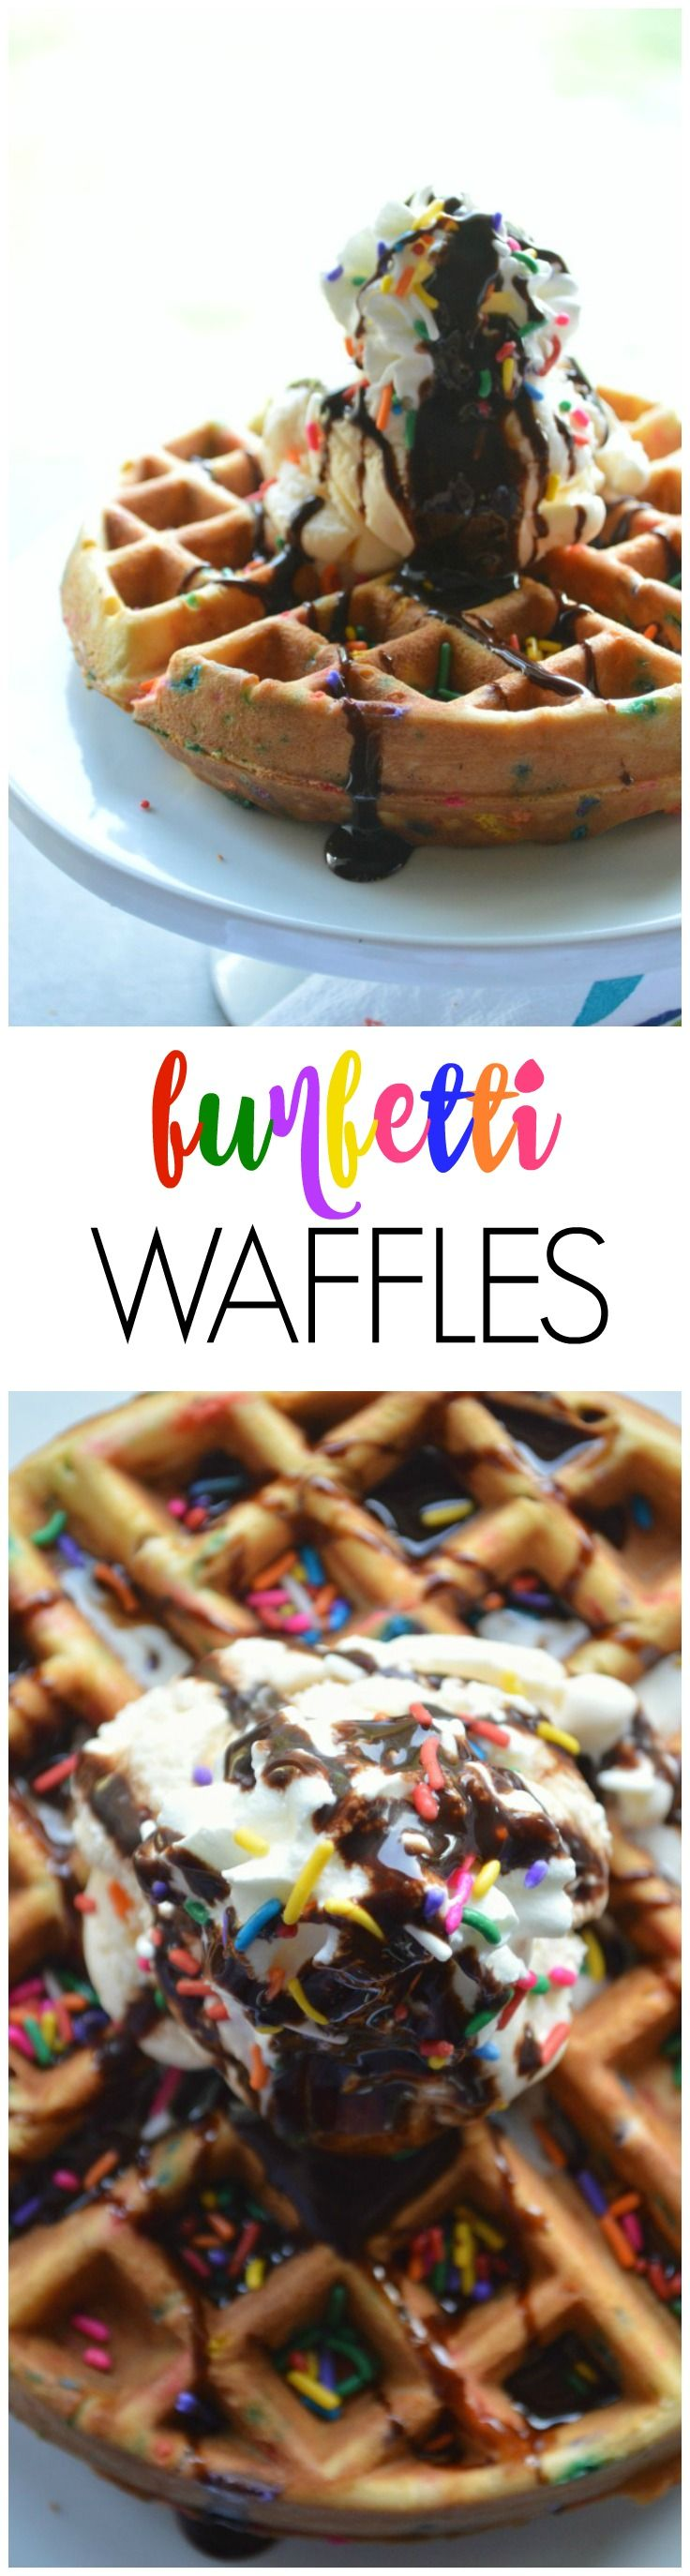 Funfetti waffles cake recipes waffle recipes sweet